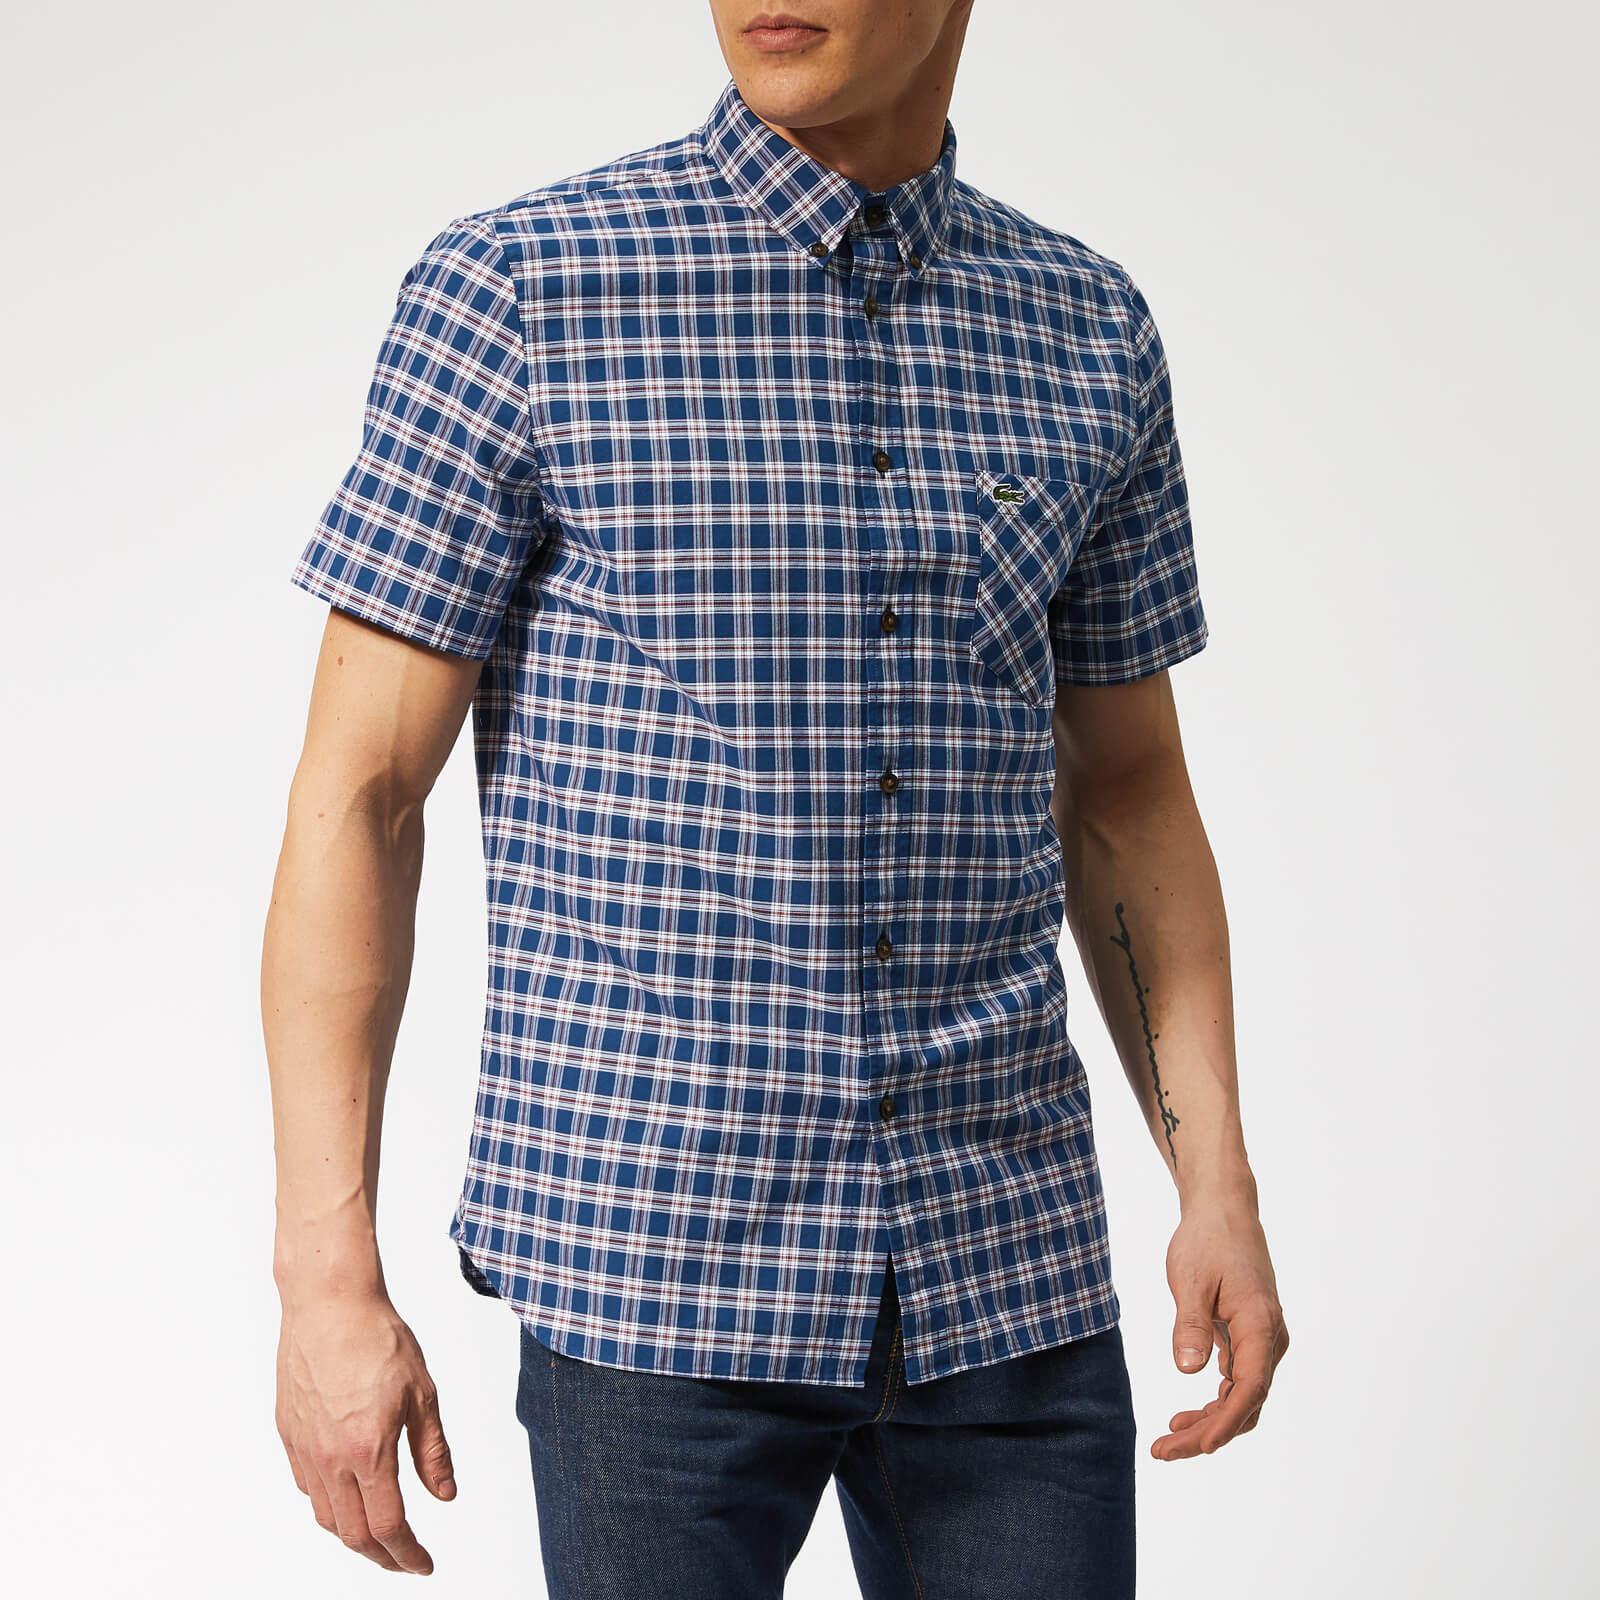 7a1ecd615b Lacoste Men's Oxford Check Short Sleeve Shirt - Inkwell/Iberis